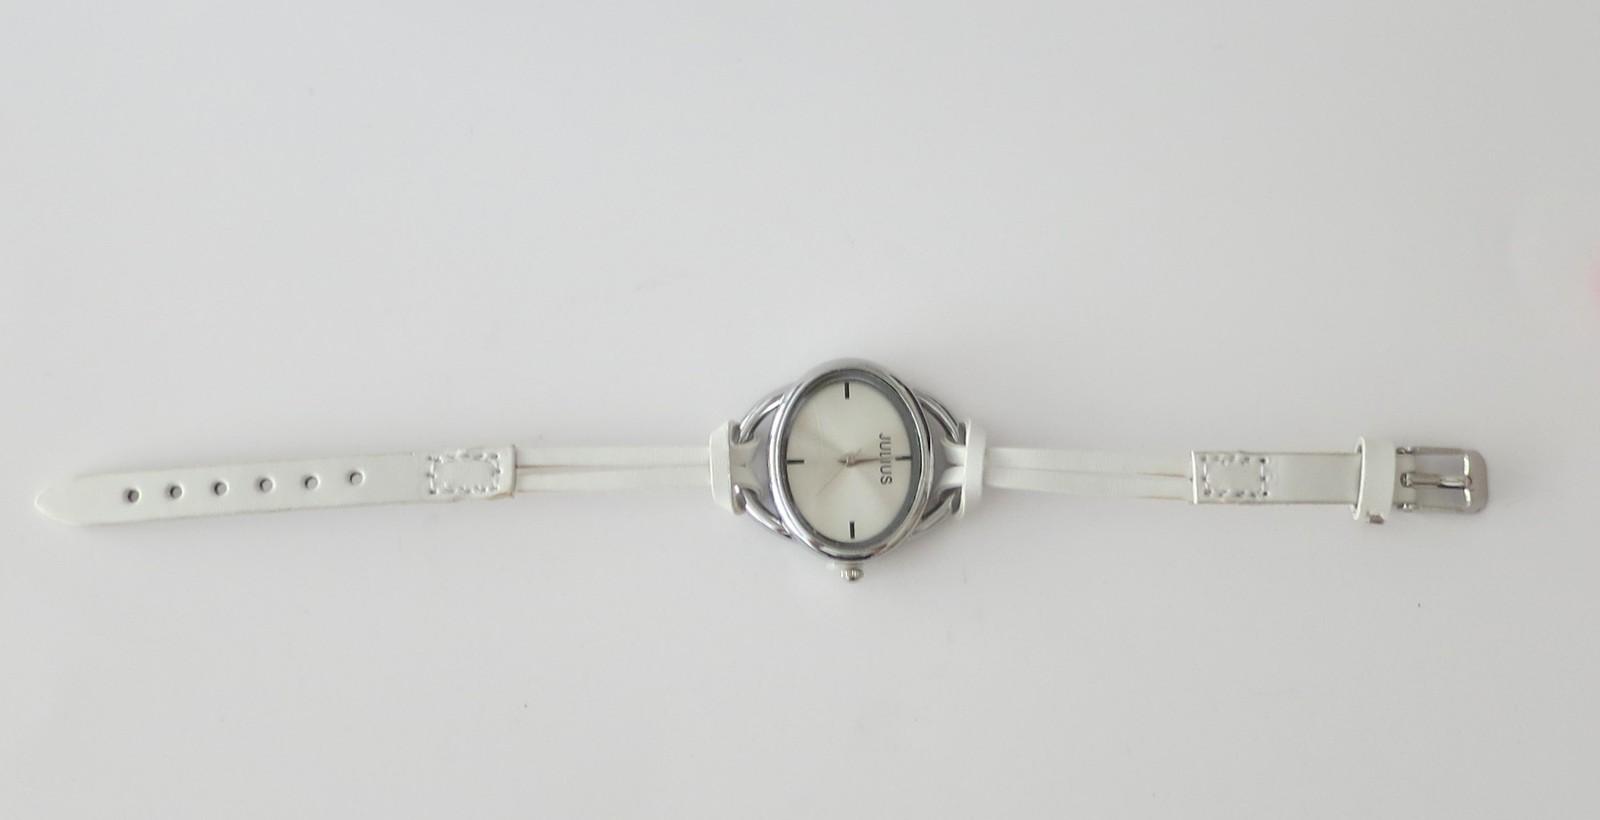 Fashion watch for women, women's watch with two straps, versatile trendy watch